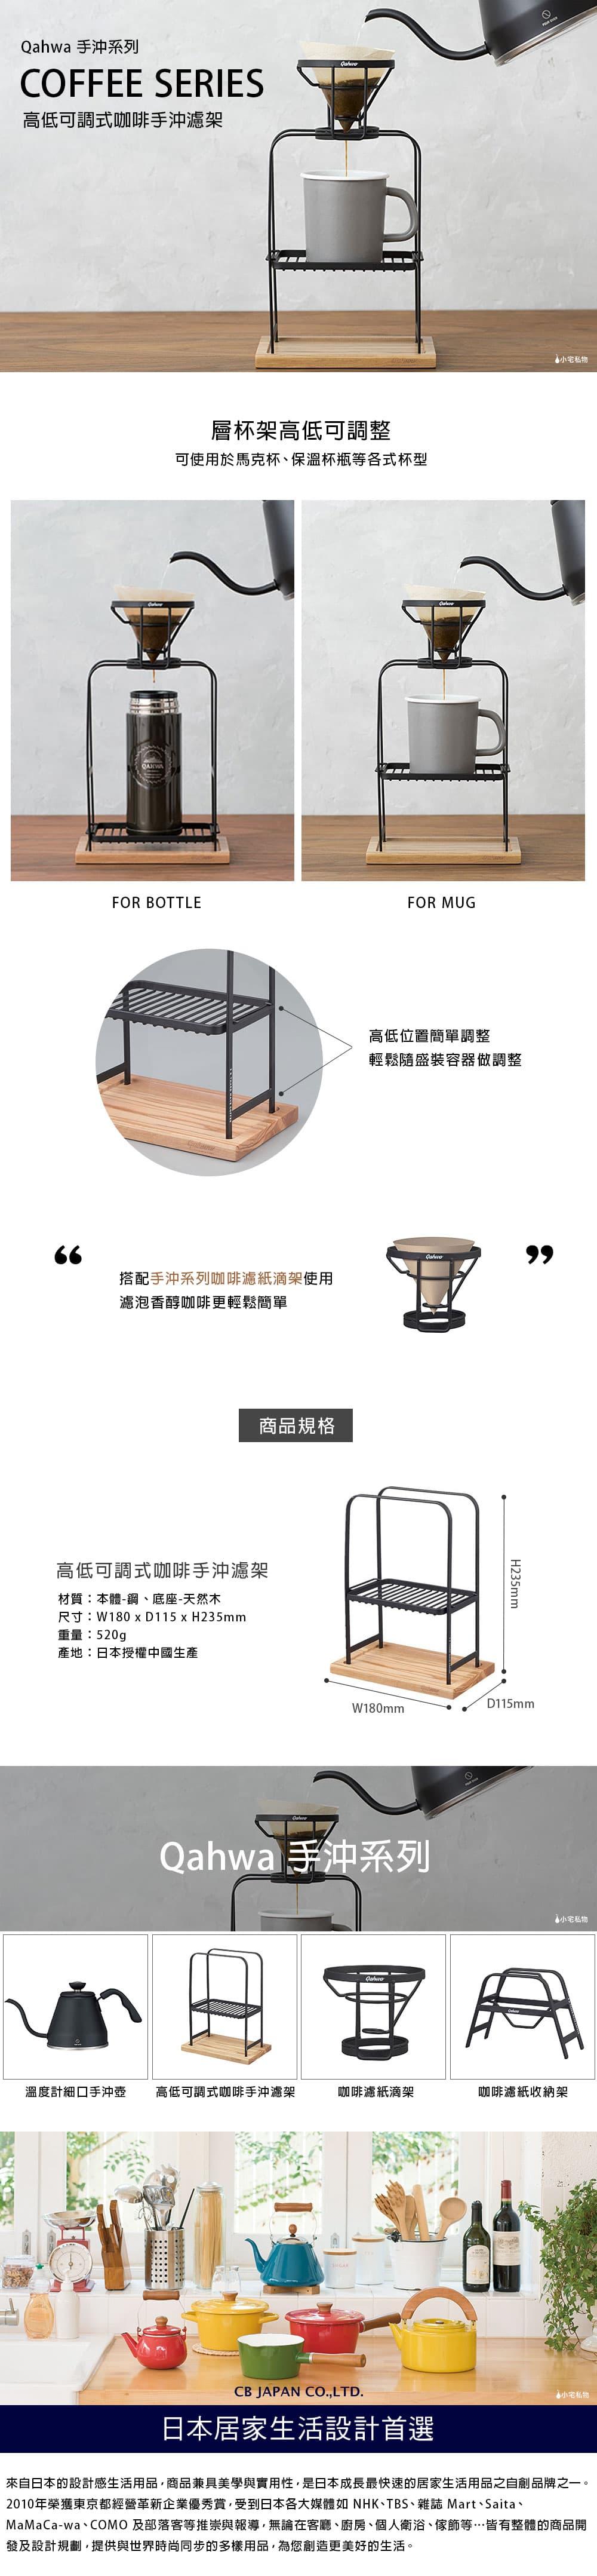 CB Japan Qahwa 手沖系列 高低可調式咖啡手沖濾架